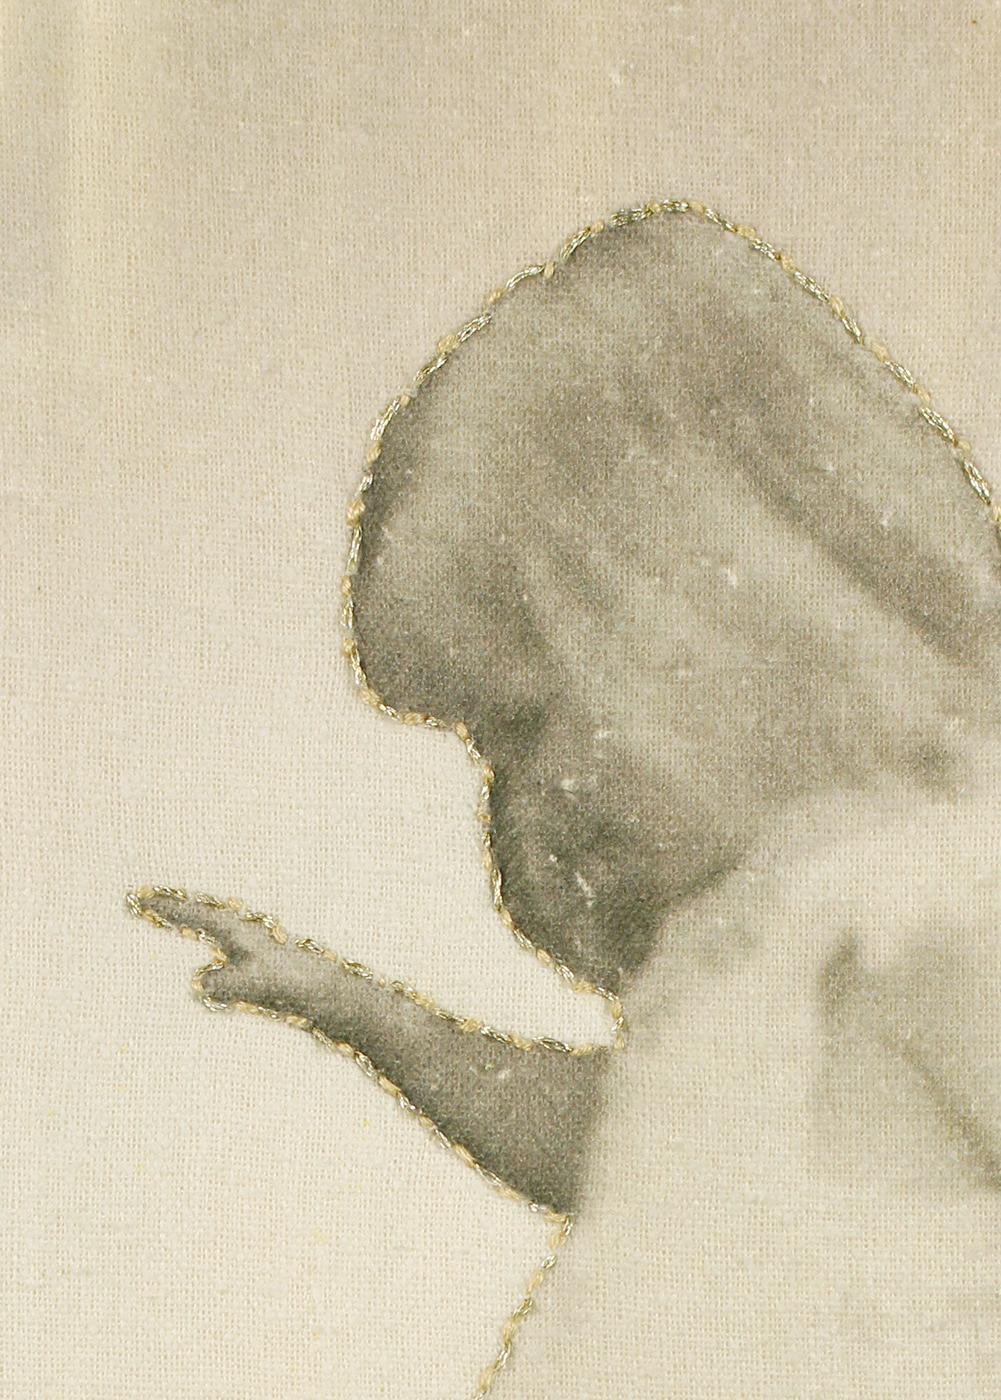 Shelley-Smith-What-The-Dream-Said-3-detail-2.jpg